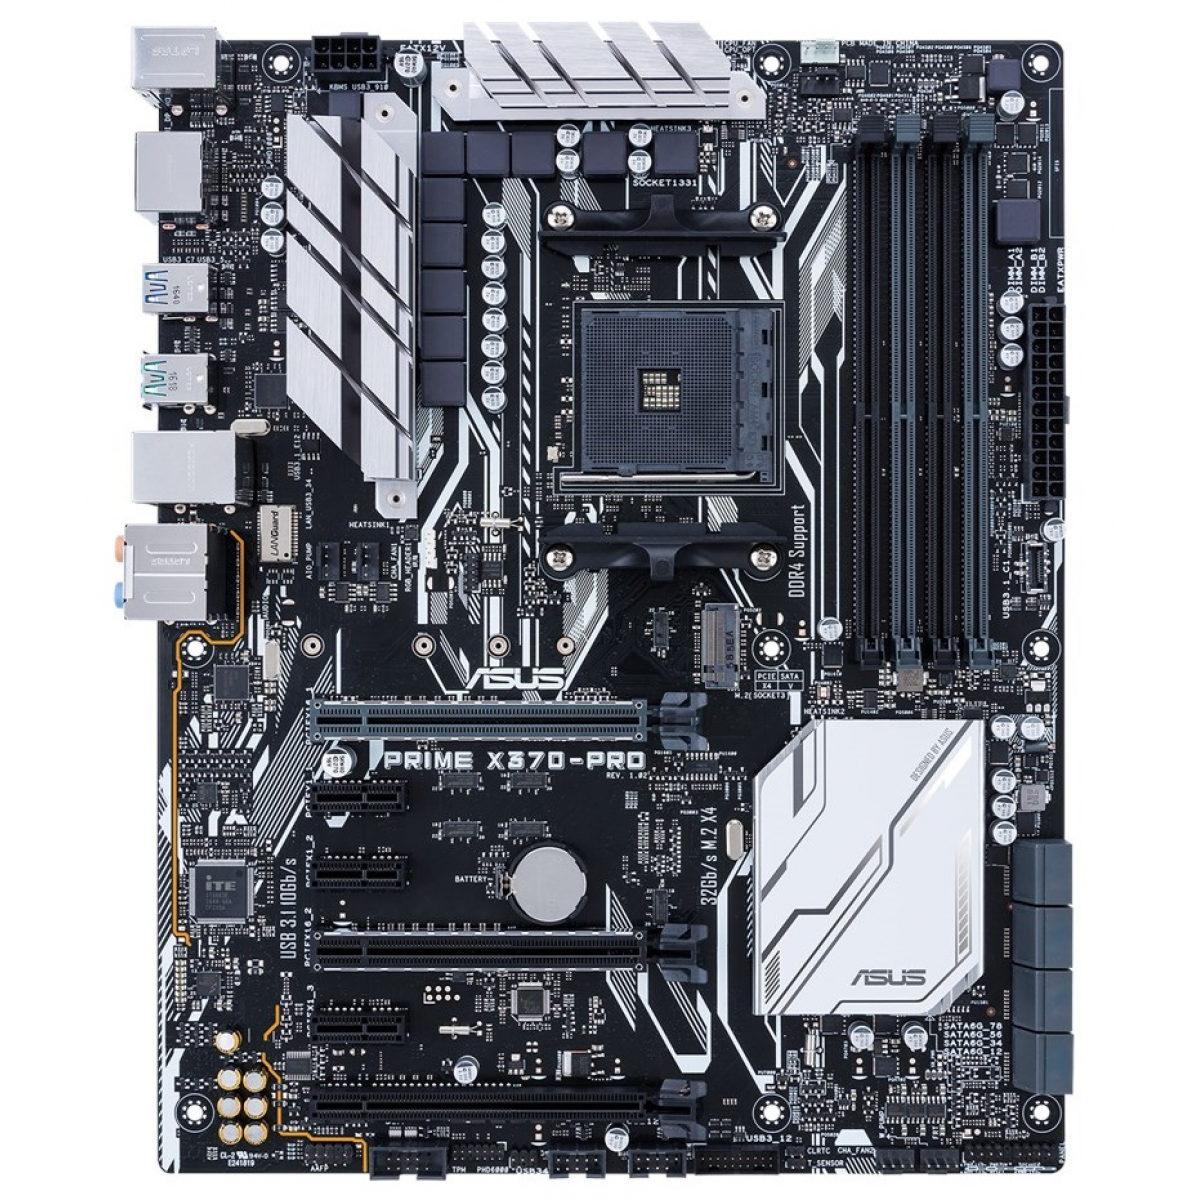 Placa Mãe Asus Prime X370-PRO, Chipset X370, AMD AM4, ATX, DDR4